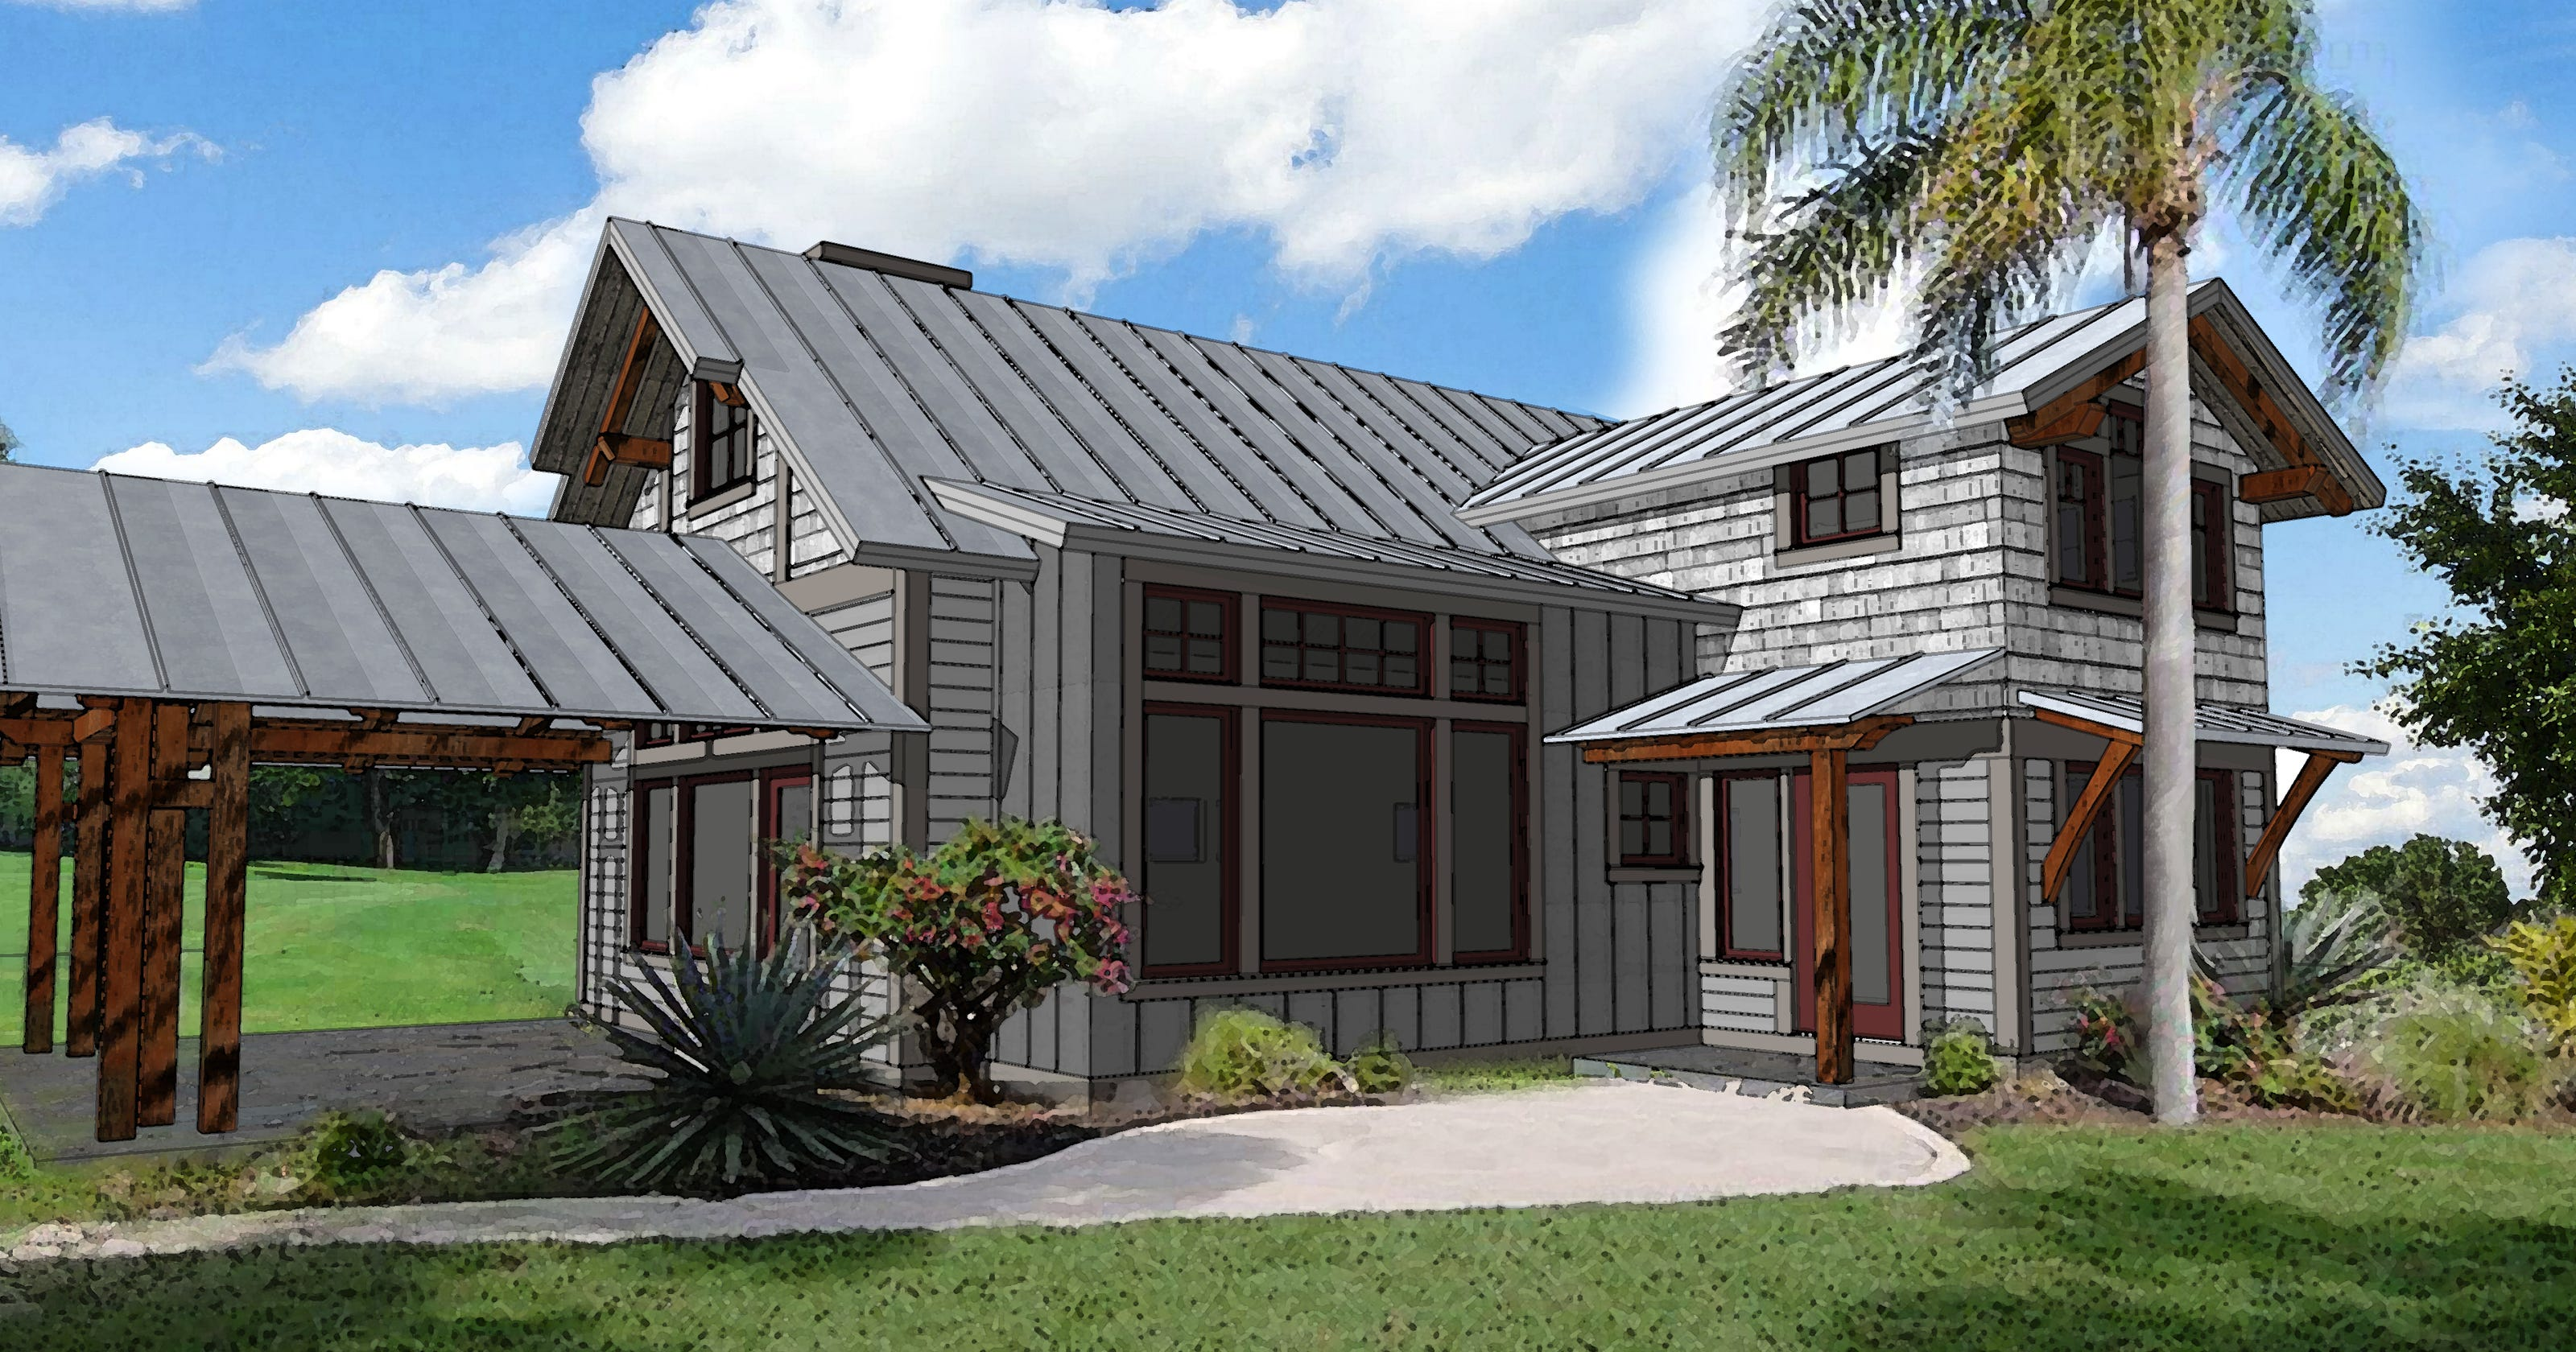 Timberbuilt Cost